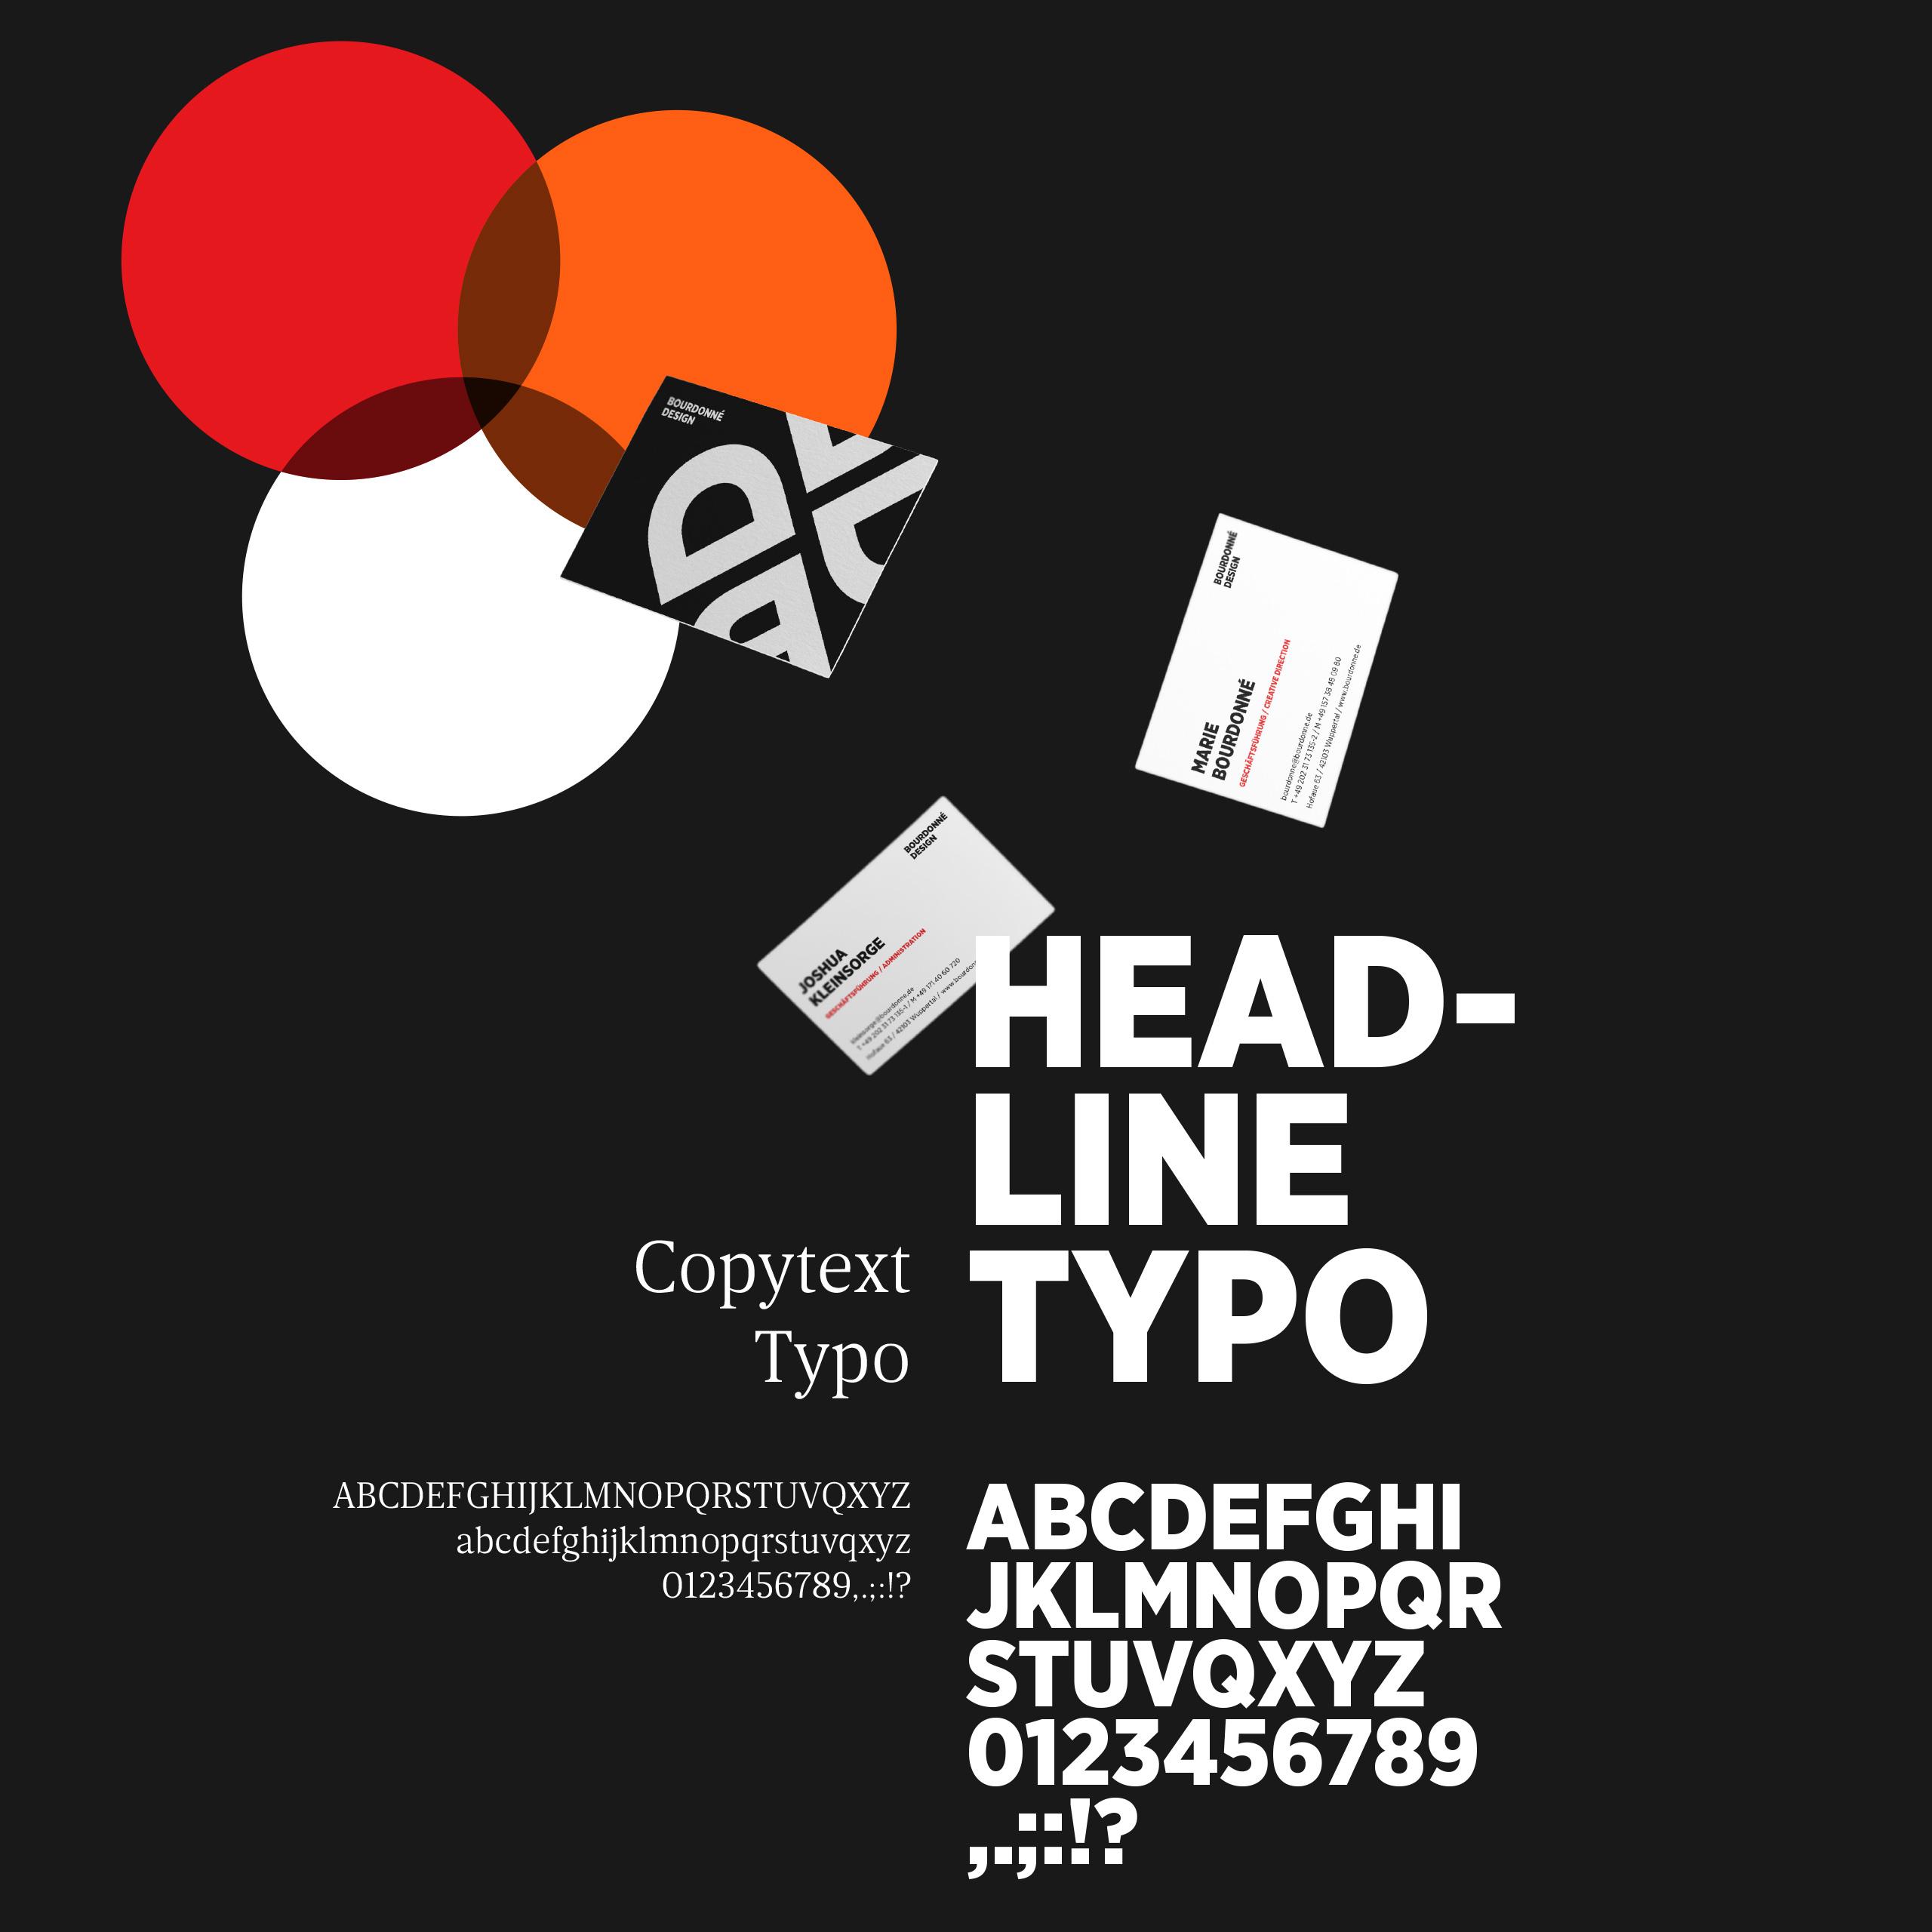 Bourdonné Design Corporate Design Geschäftsausstattung Typografie